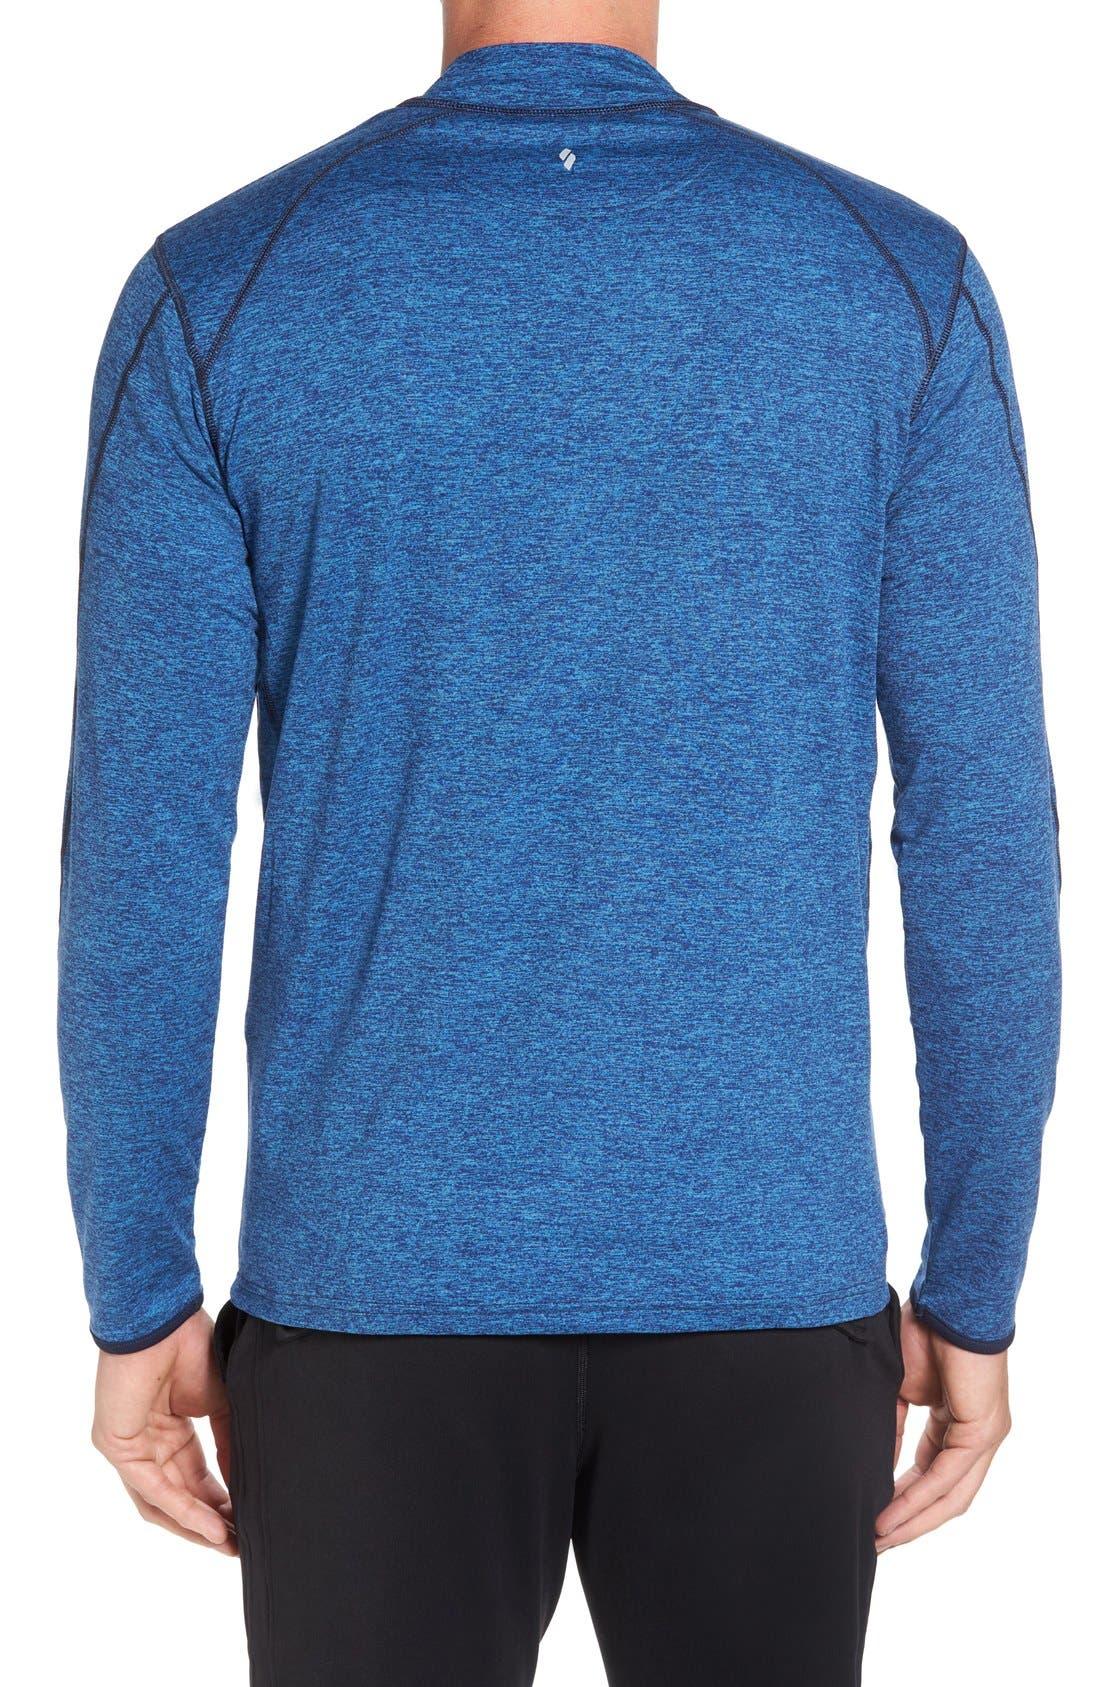 SODO, 'Elevate' Moisture Wicking Stretch Quarter Zip Pullover, Alternate thumbnail 4, color, OCEAN BLUE/ NAVY